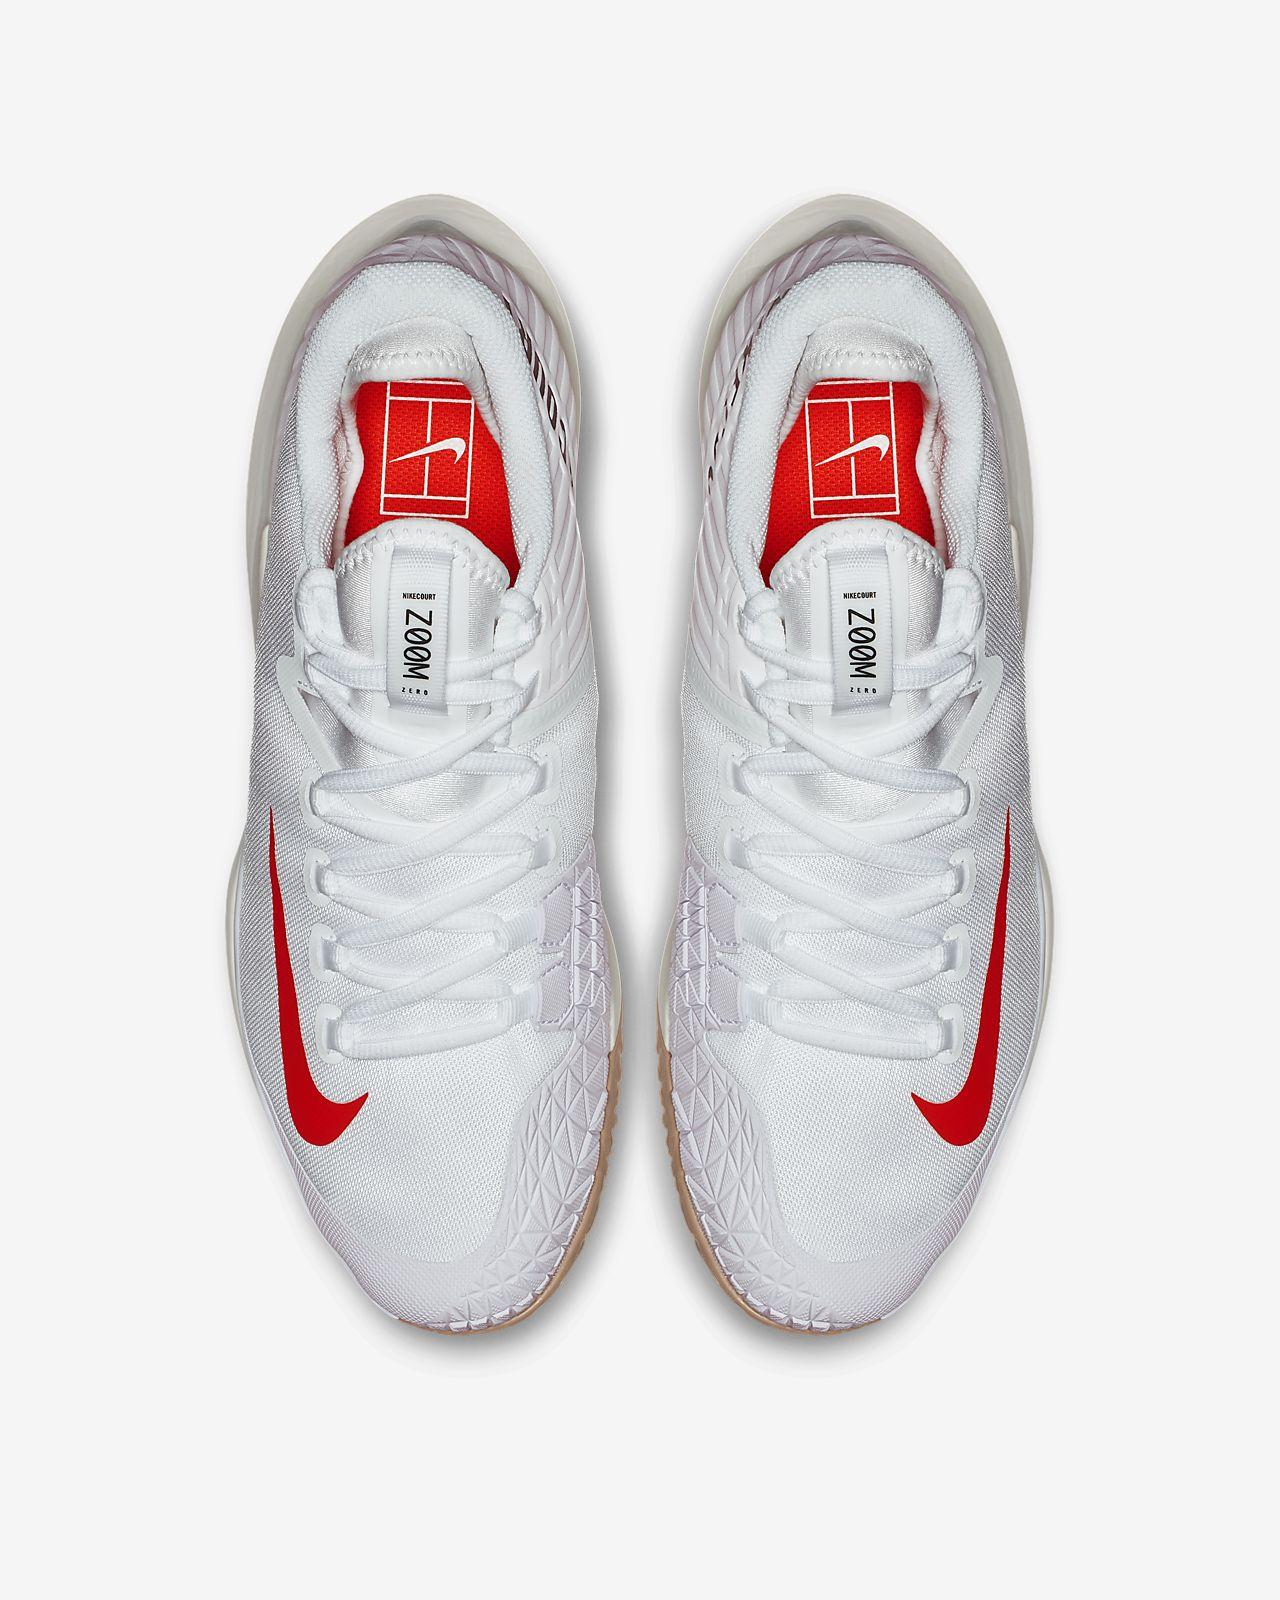 60d49f46cfdf NikeCourt Air Zoom Zero Men s Tennis Shoe. Nike.com GB